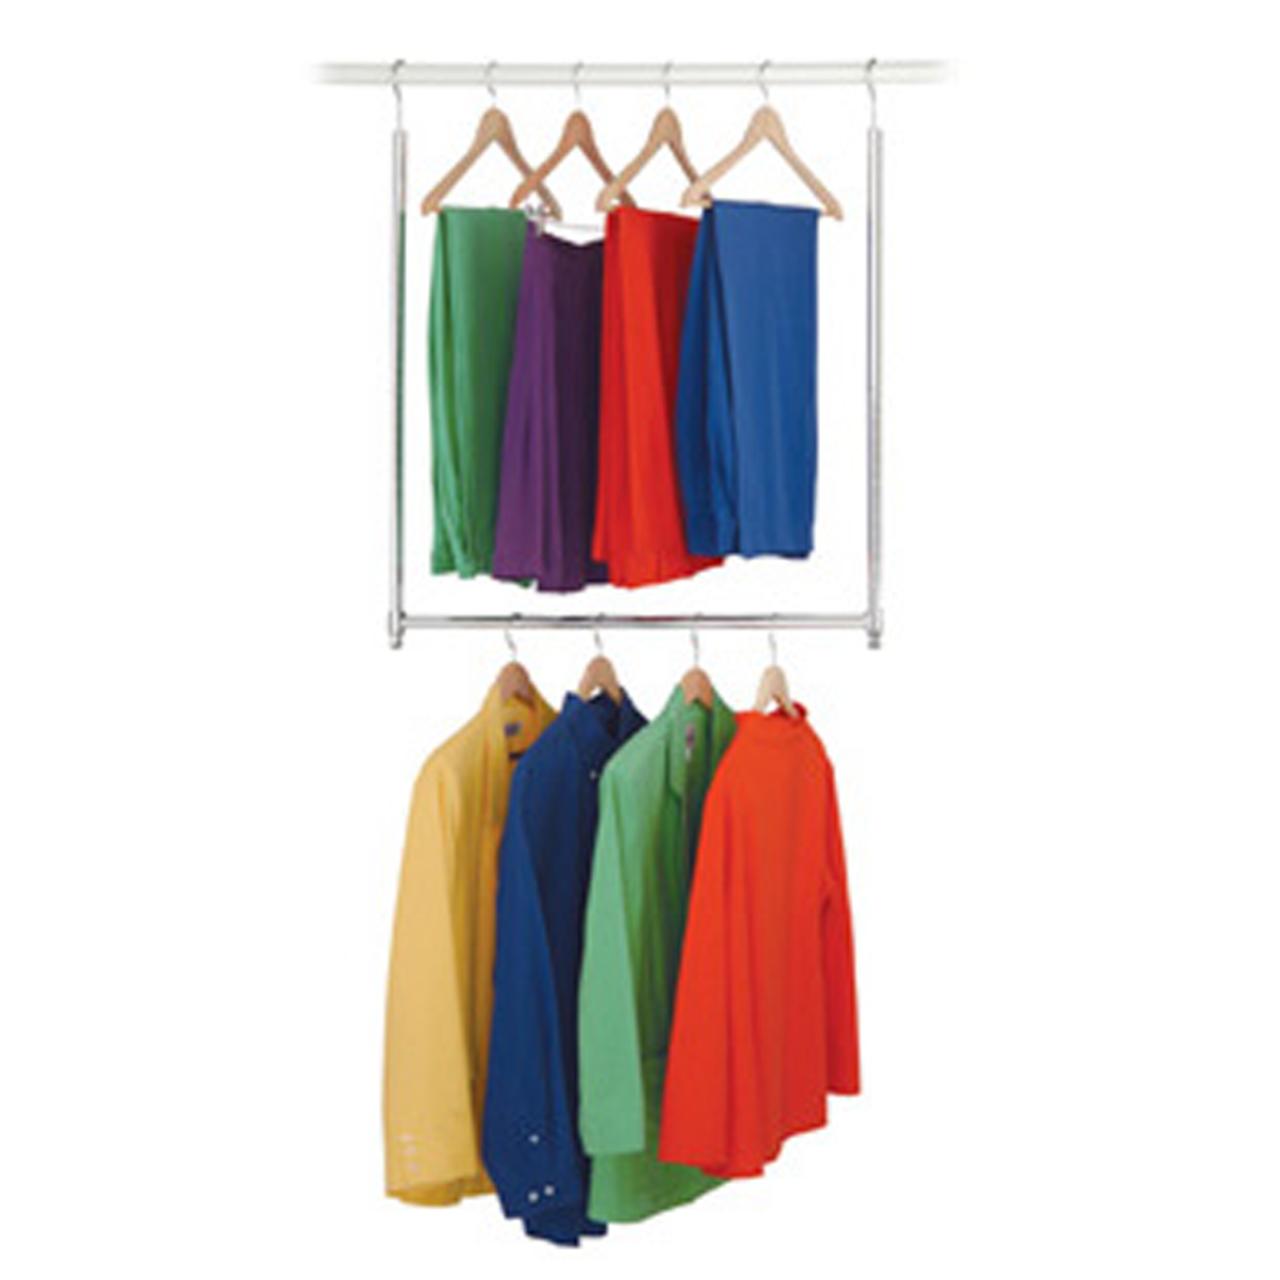 Adjustable Closet Doubler